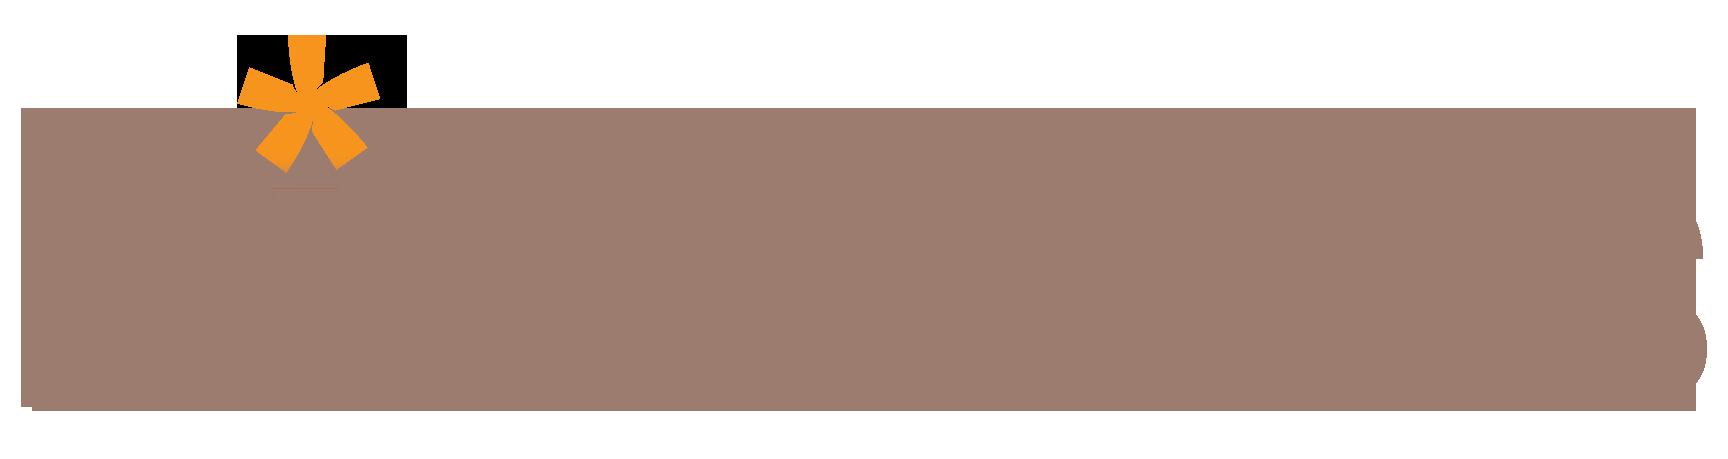 HiSessions_Logo_Banner_New.png